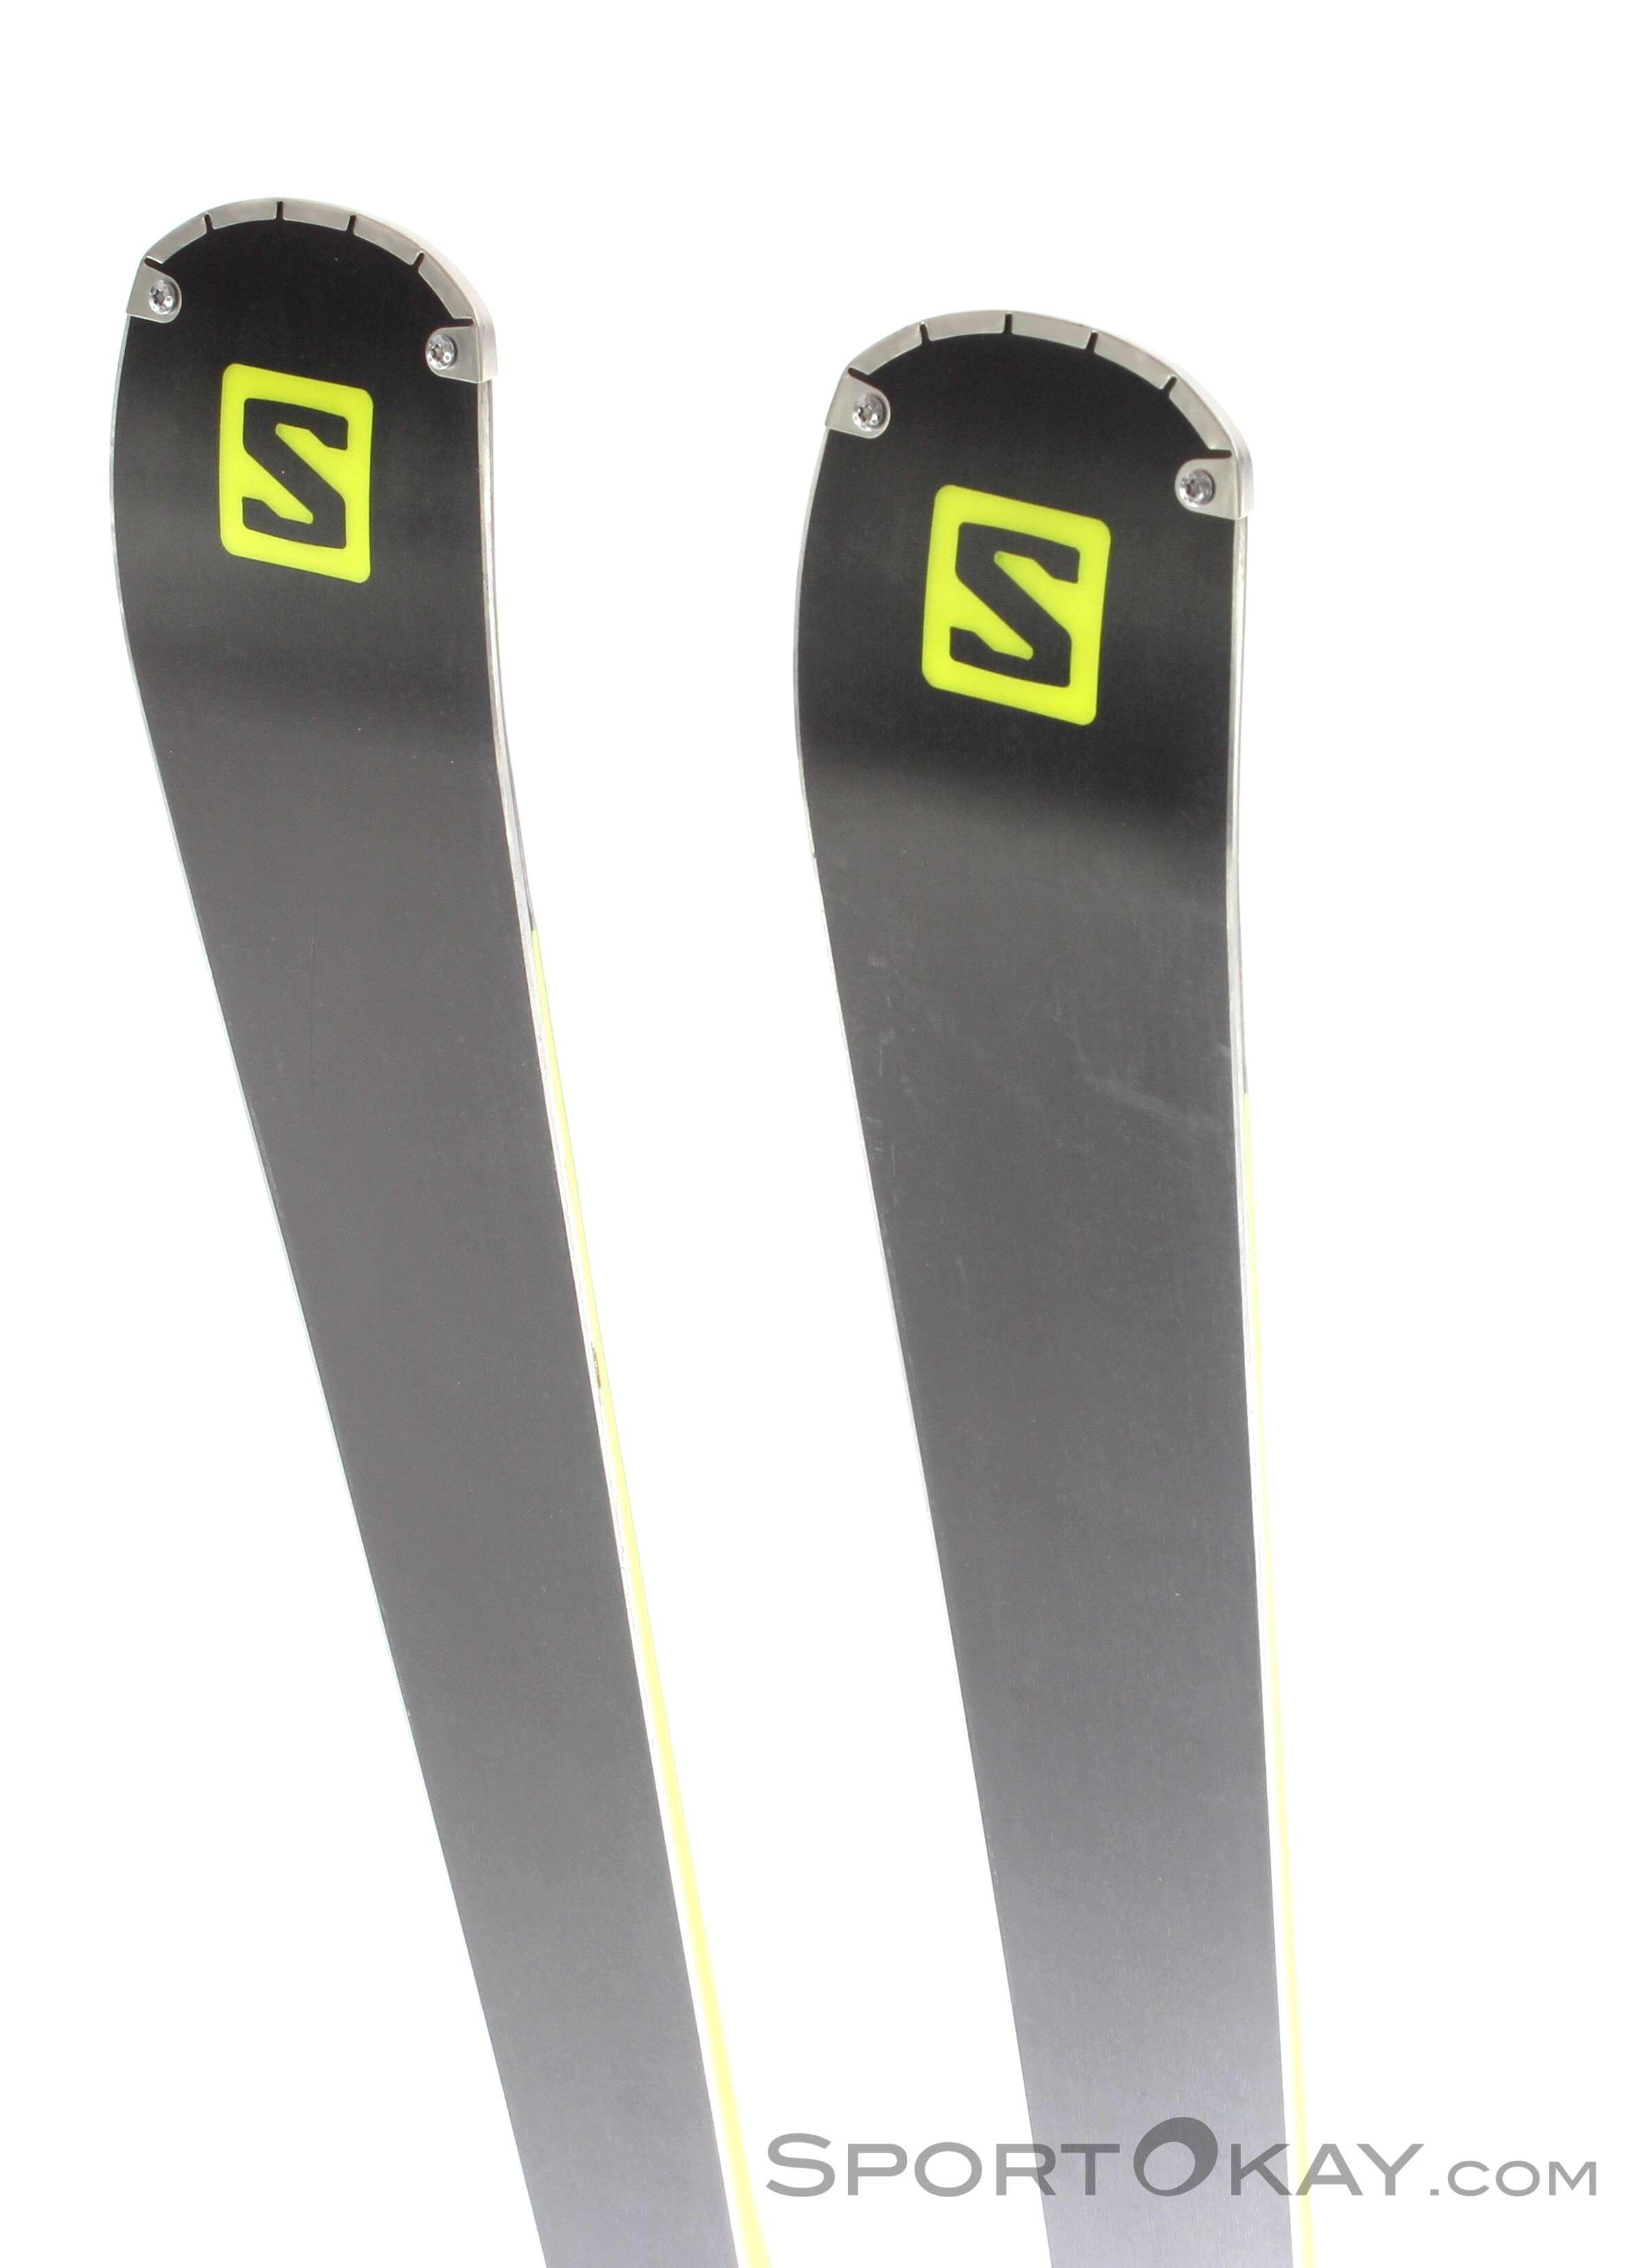 Salomon SMax 10 + Z12 Walk Ski Set 2019 Alpine Skis